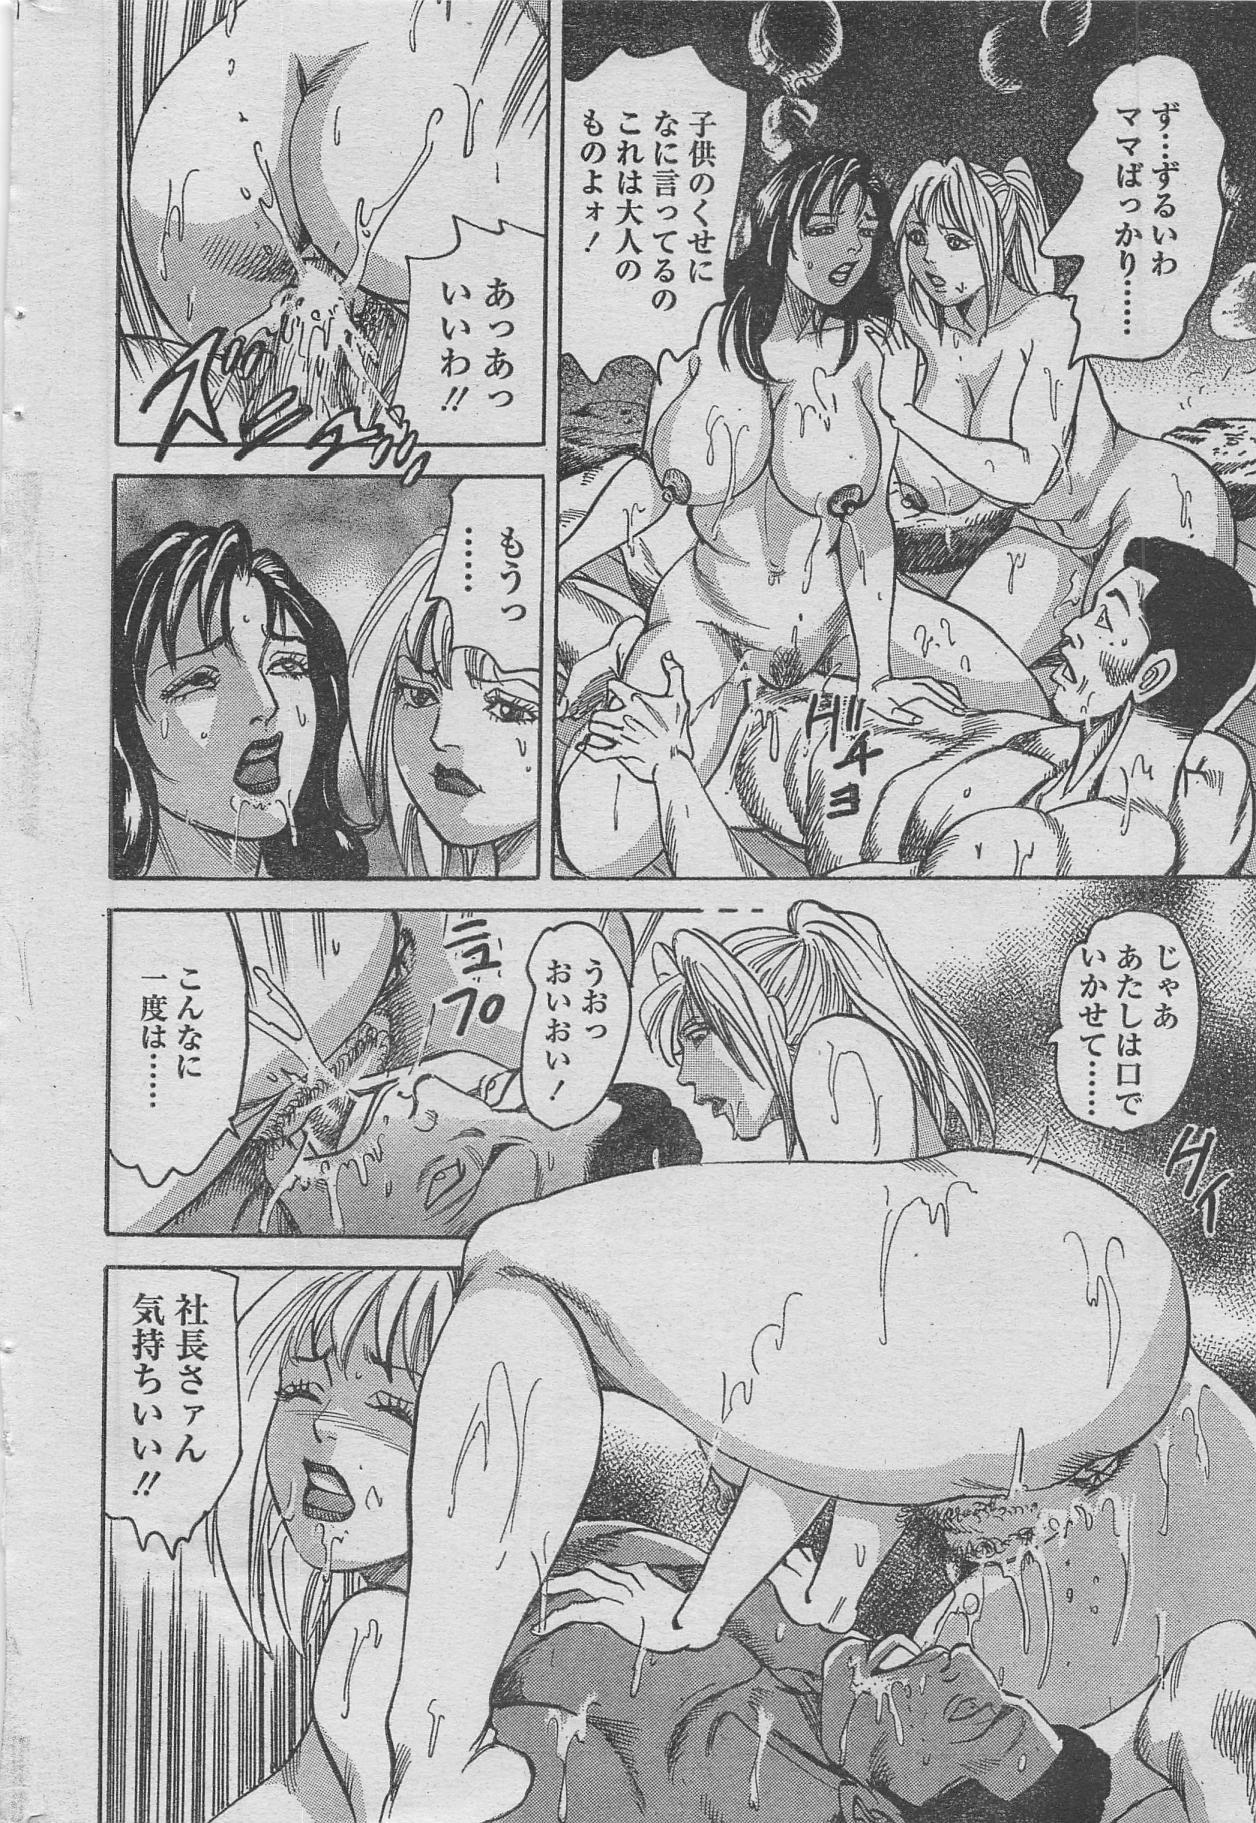 Manga Lawrence 2013-04 39